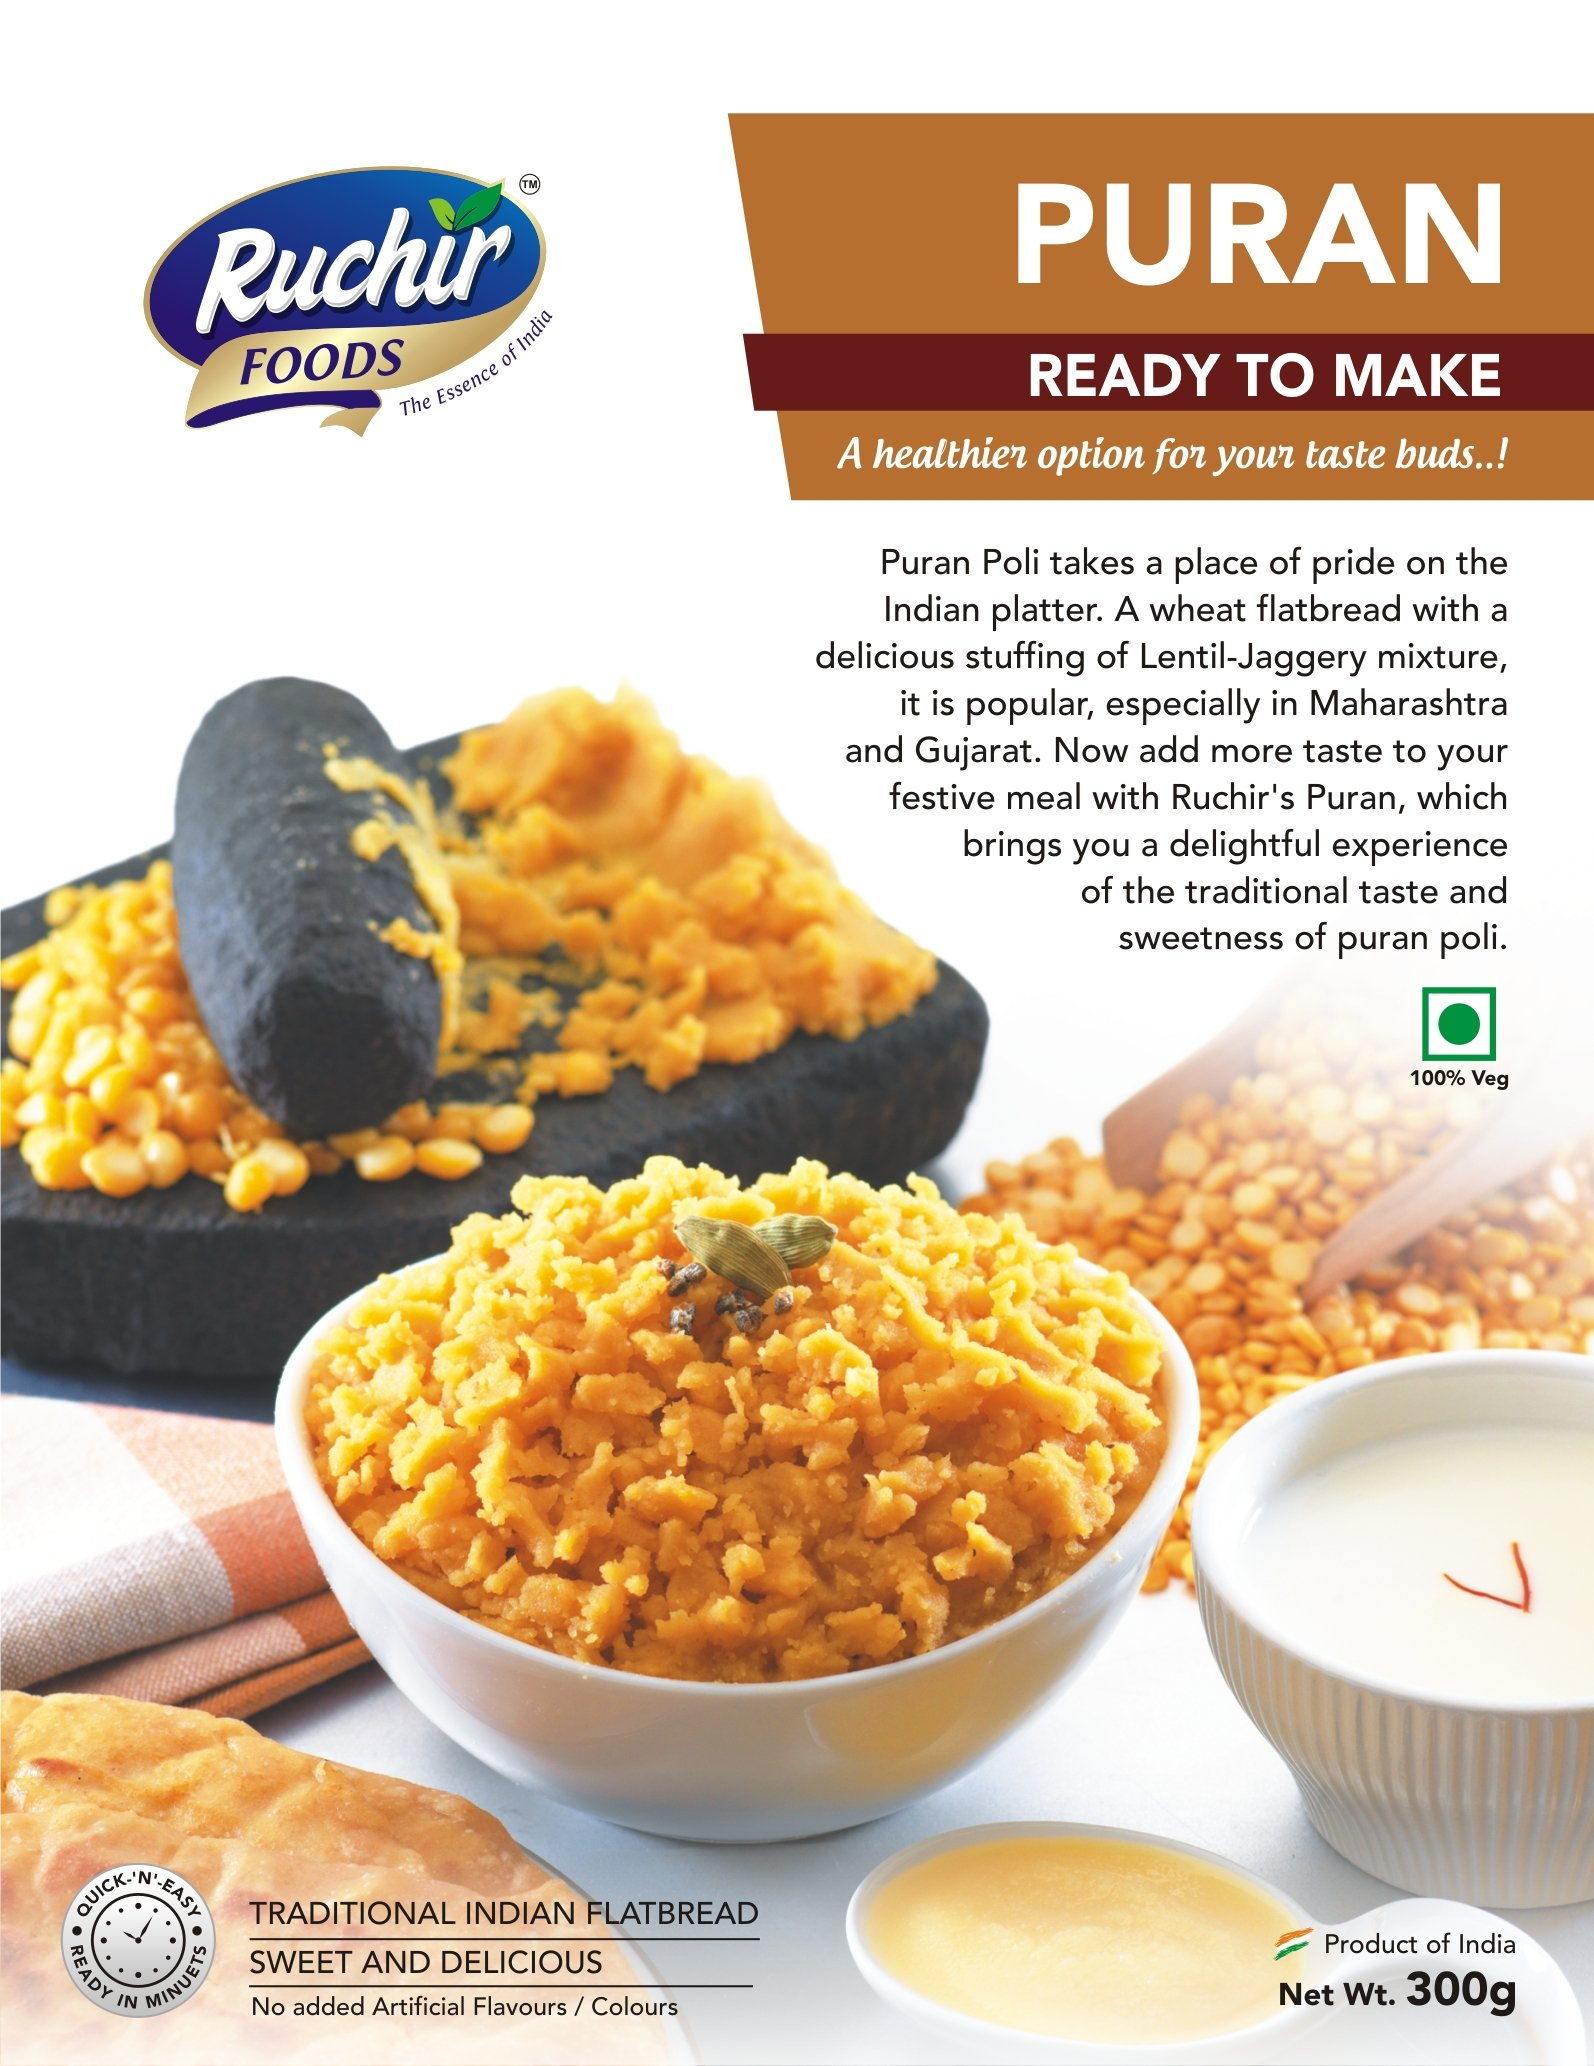 Ruchir Foods Puran - 300 Grams - Ready to Make